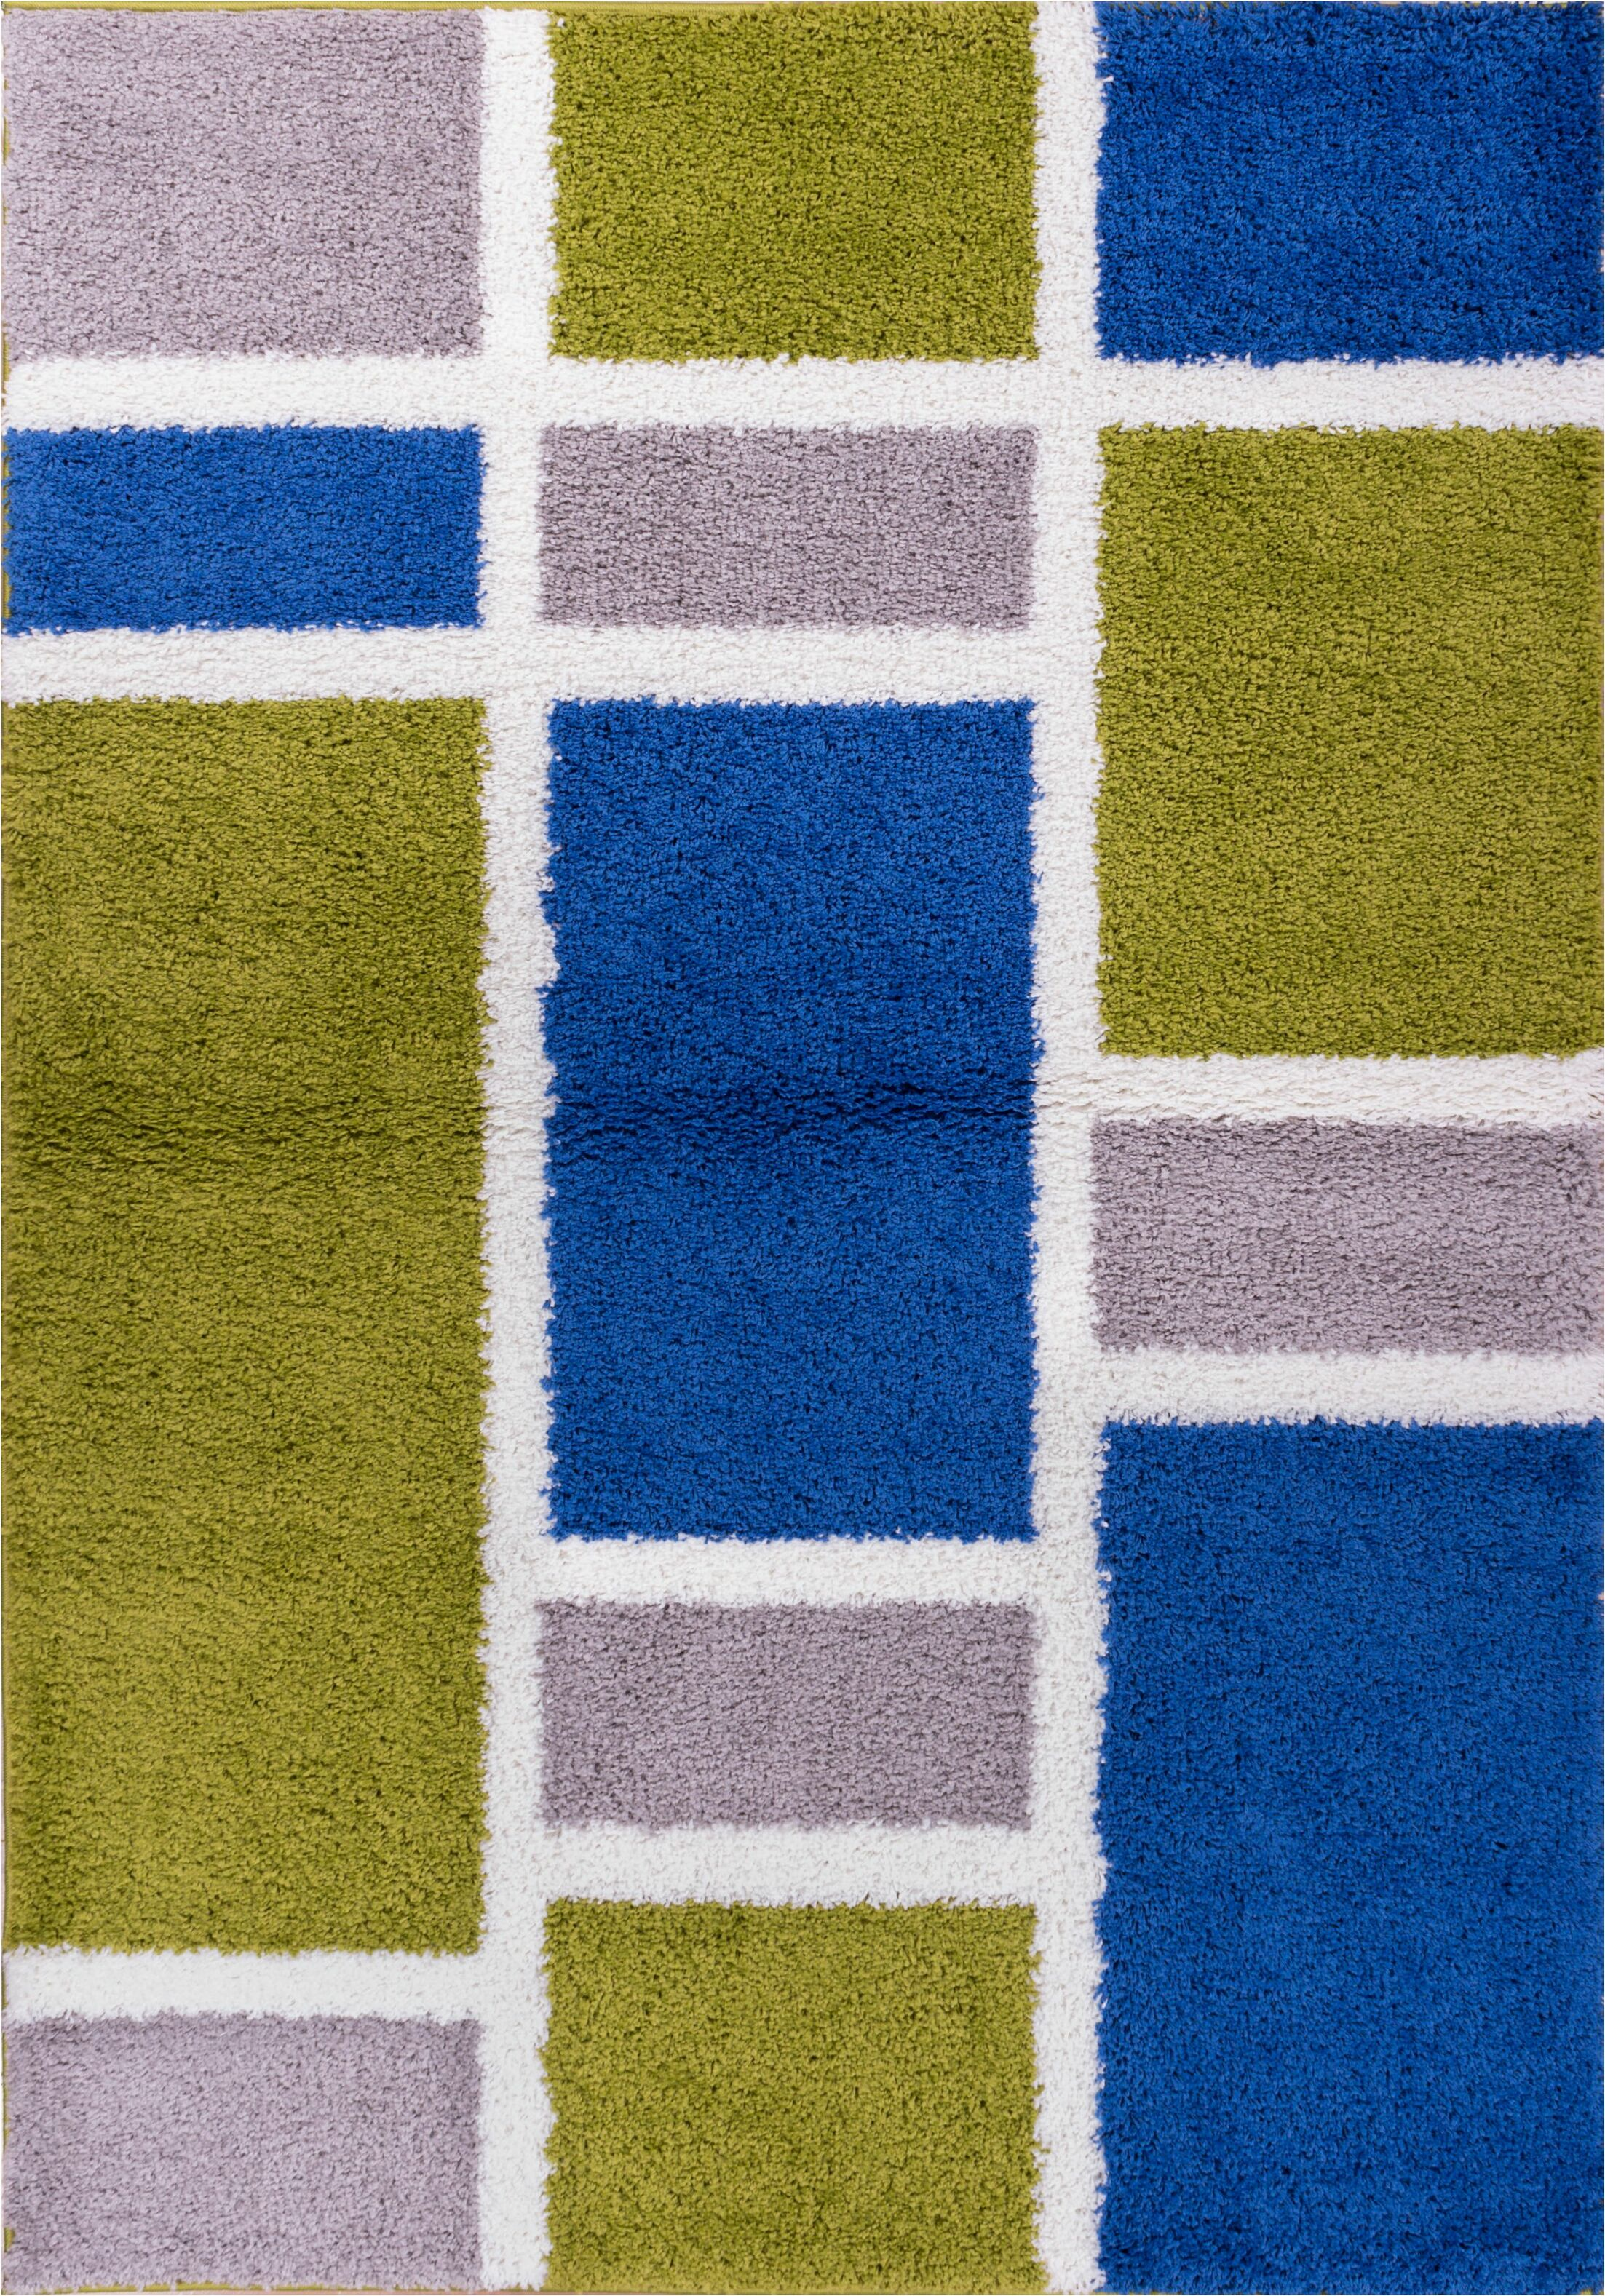 Dondre Green/Blue Indoor Area Rug Rug Size: 6'7'' x 9'10''